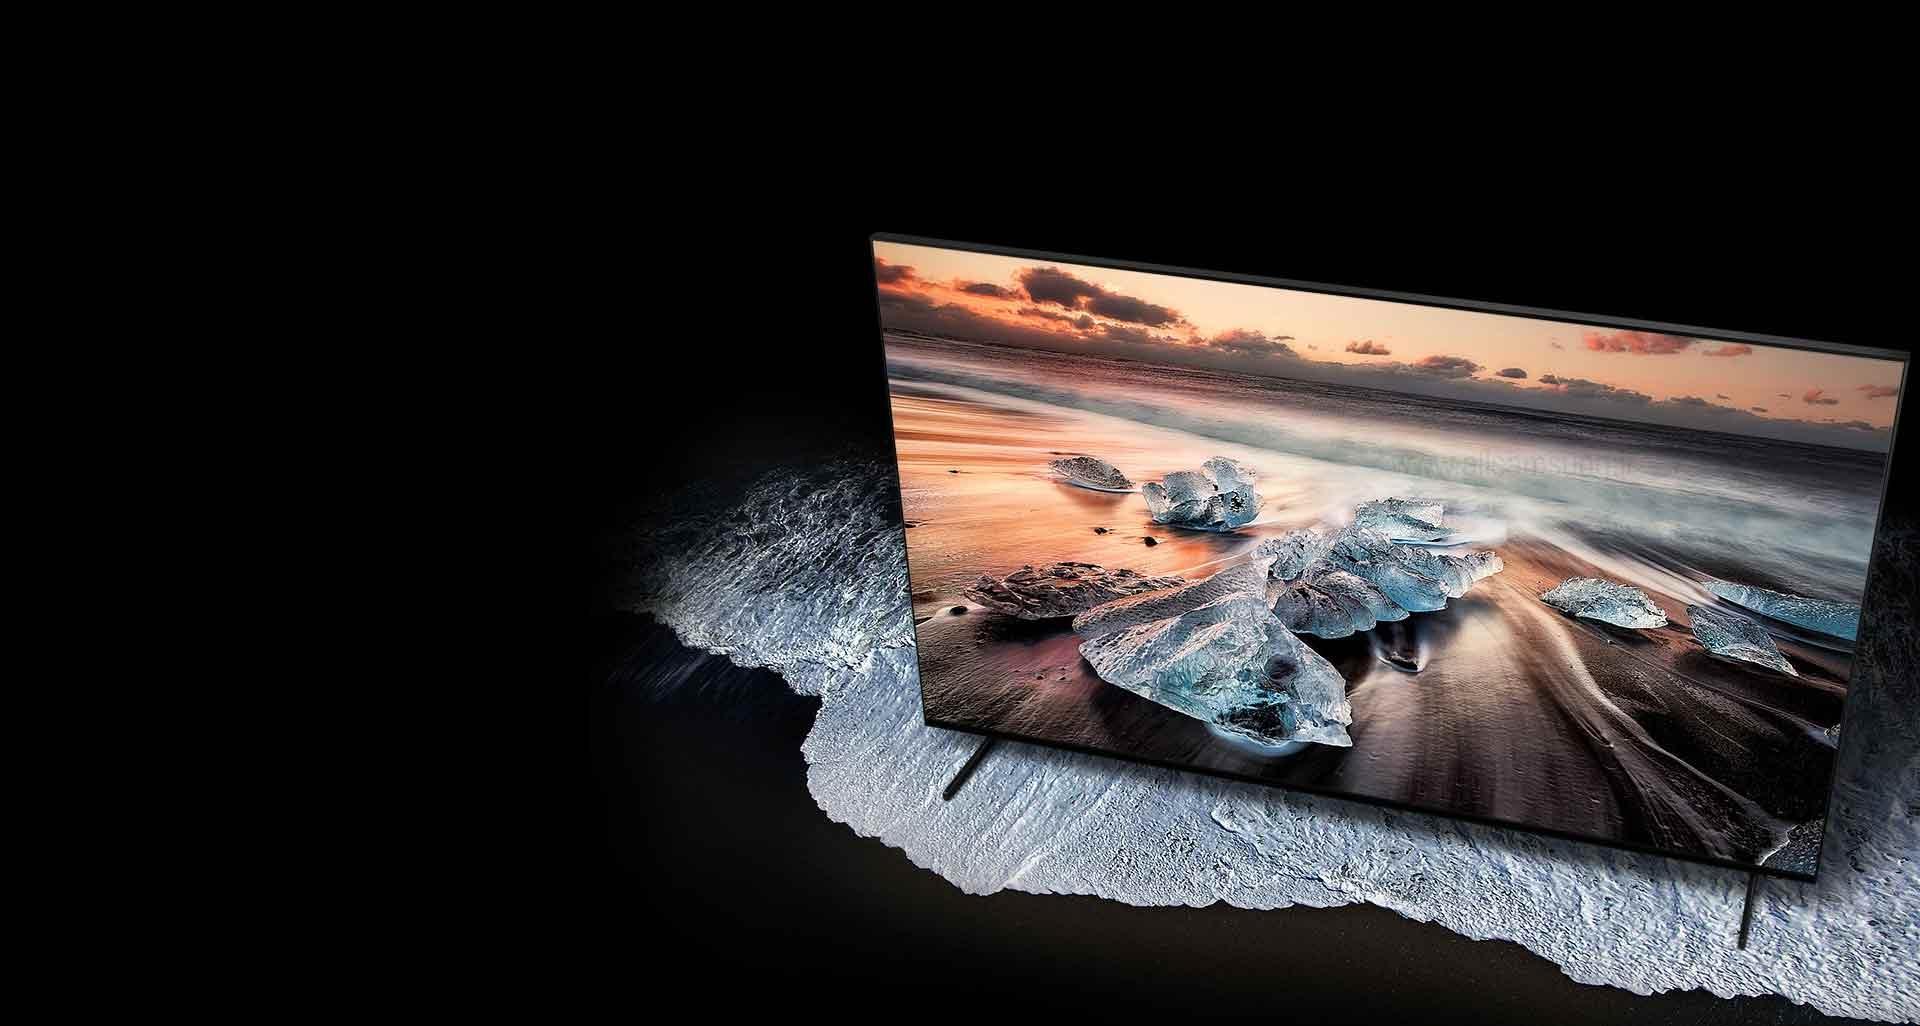 آشنایی با تلویزیون هوشمند کیو ال ای دی 8K